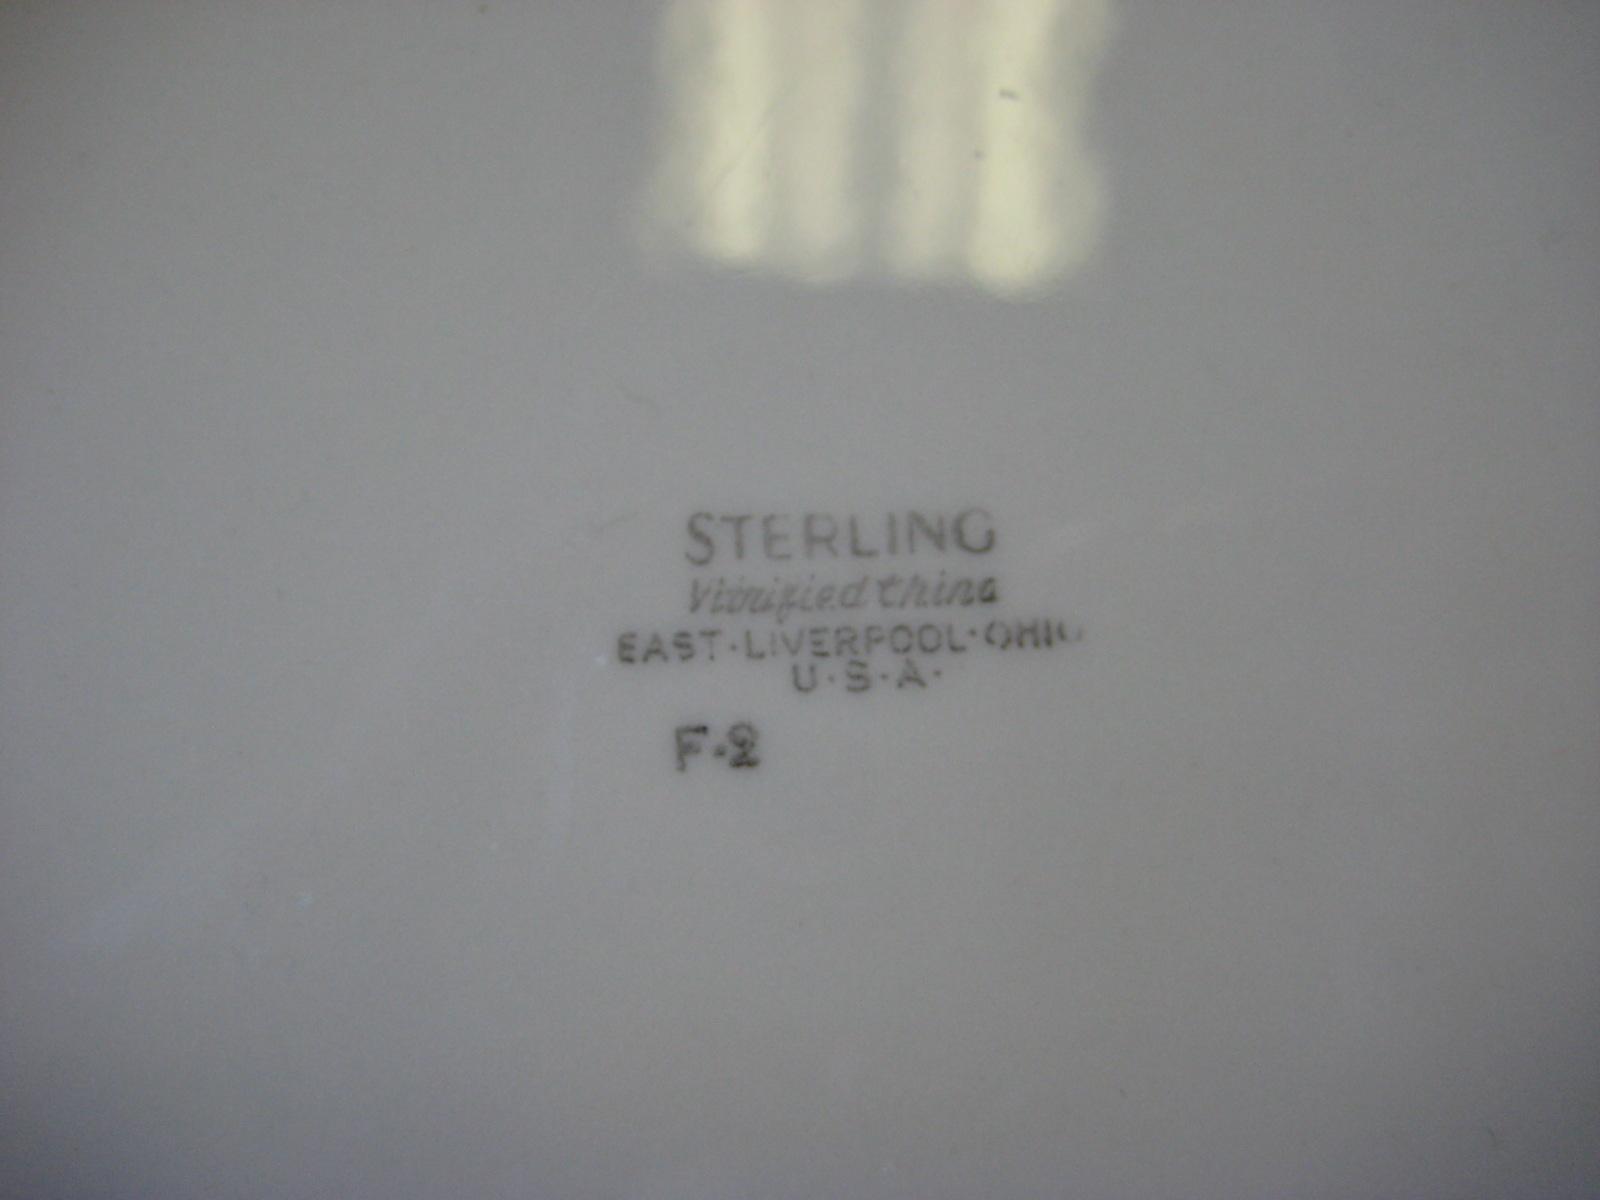 Playboy Club Sterling China F-2